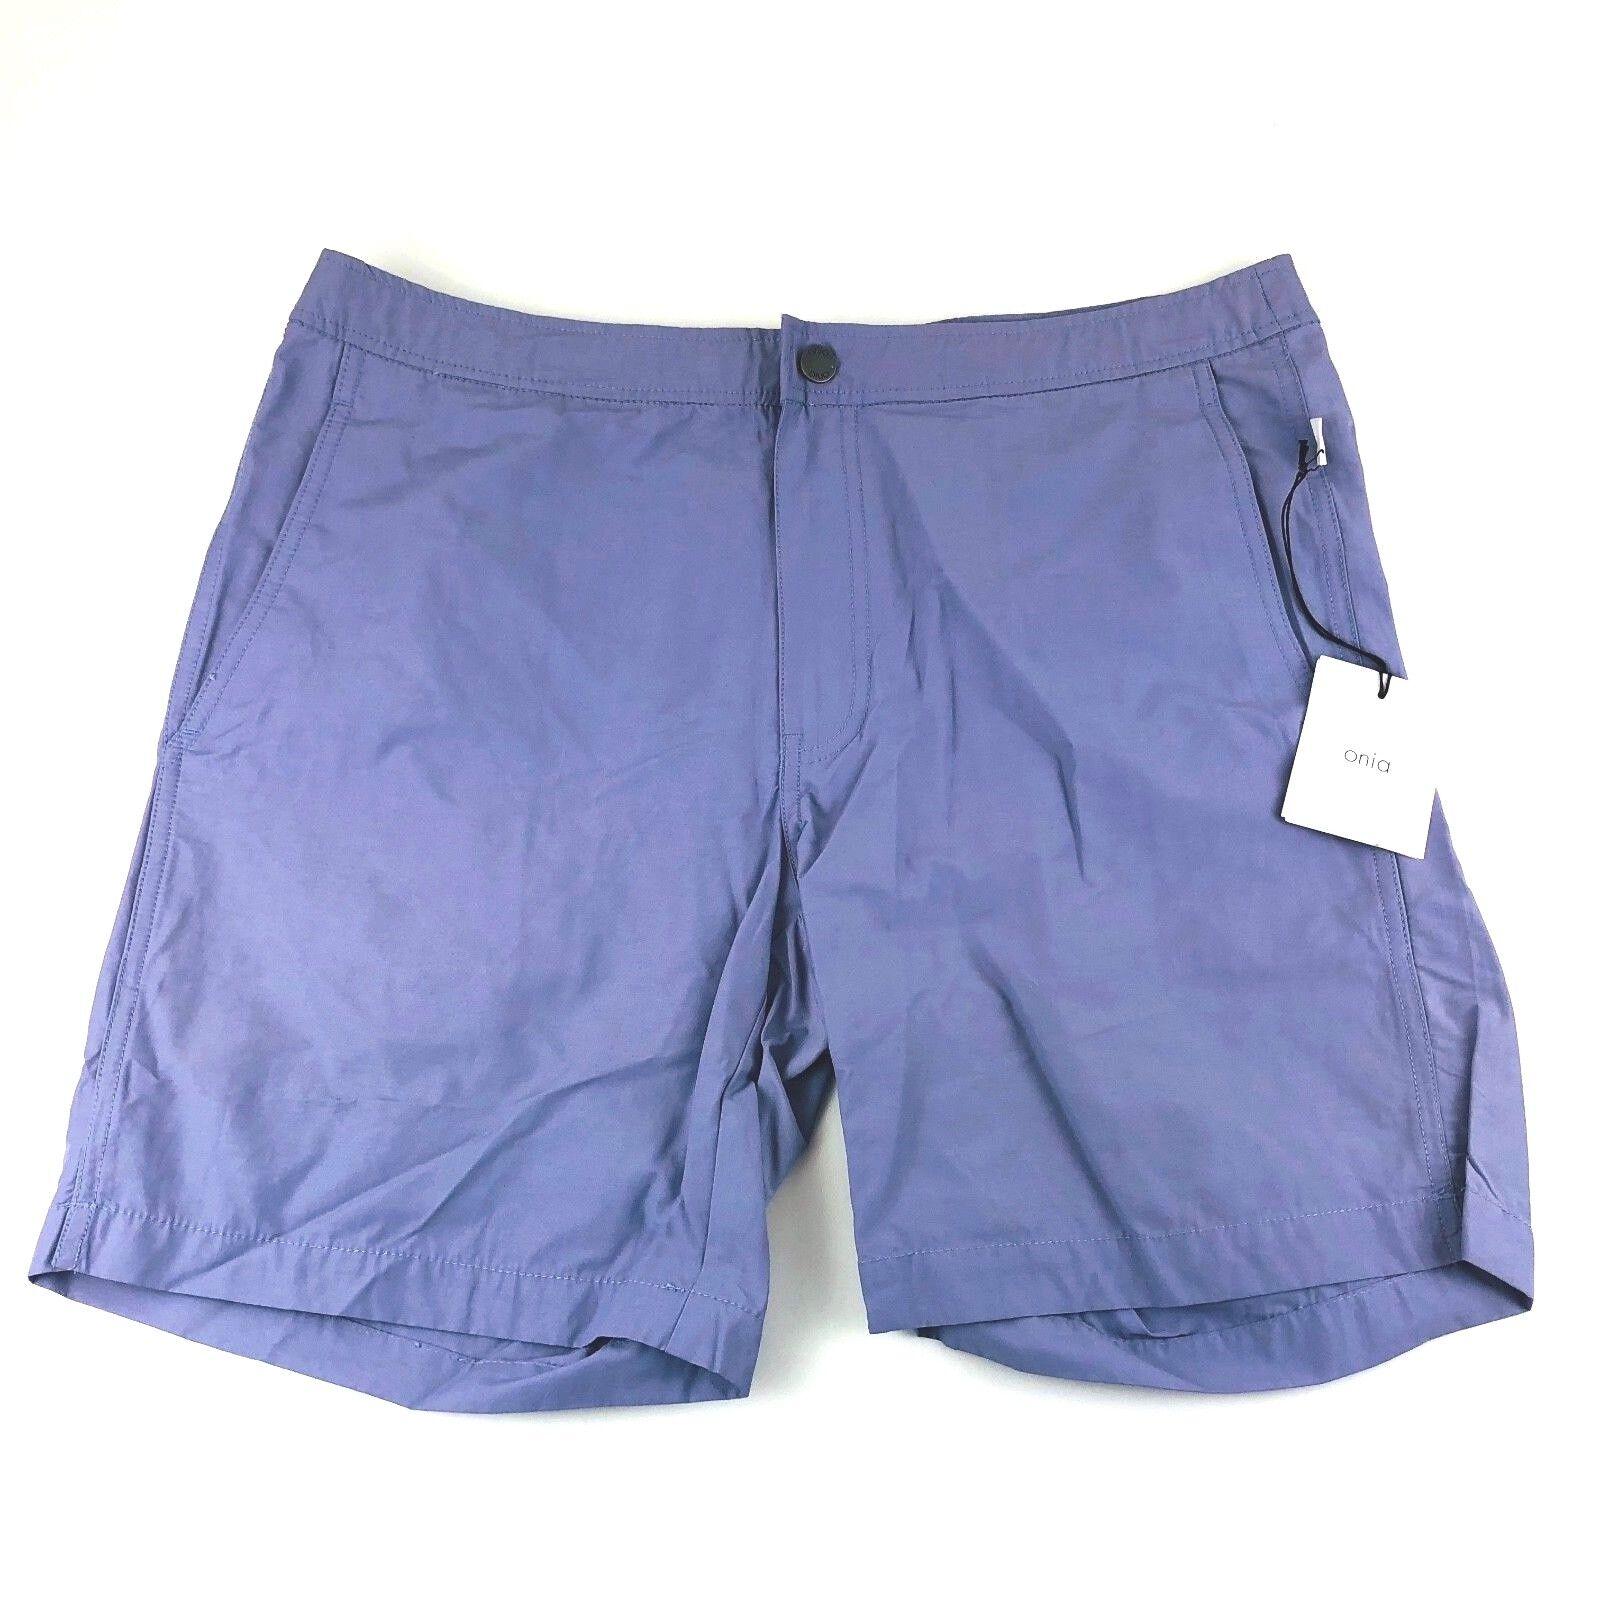 Onia Hyac Calder Lavender Swim Trunks 7.5 Shorts Mens Size 34 38 NWT